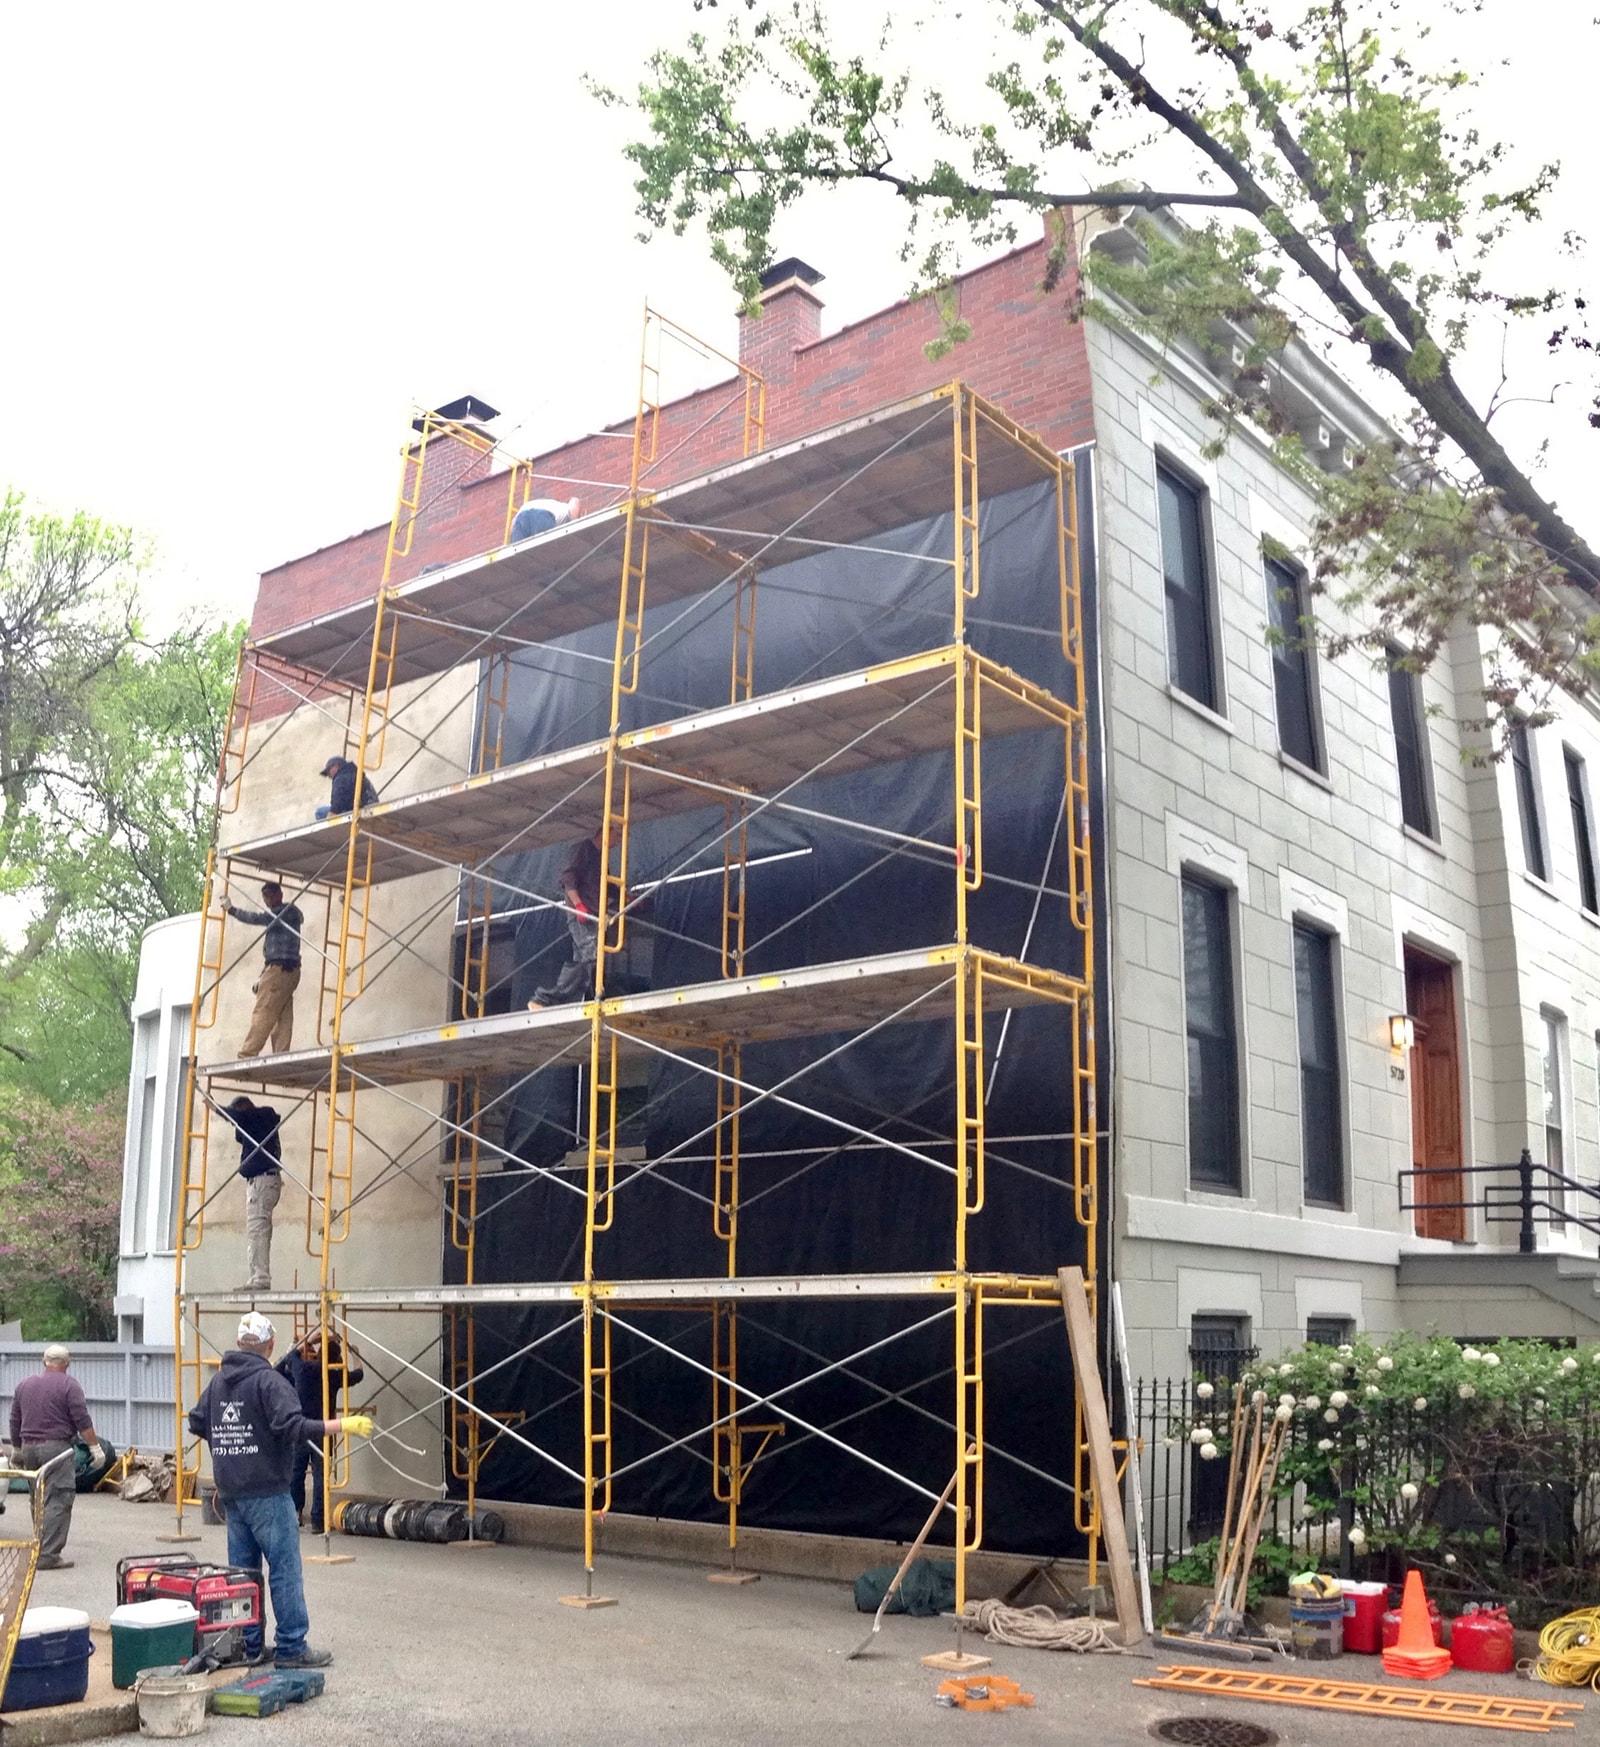 Workers installing vinyl tarpaulins on wall of masonry building